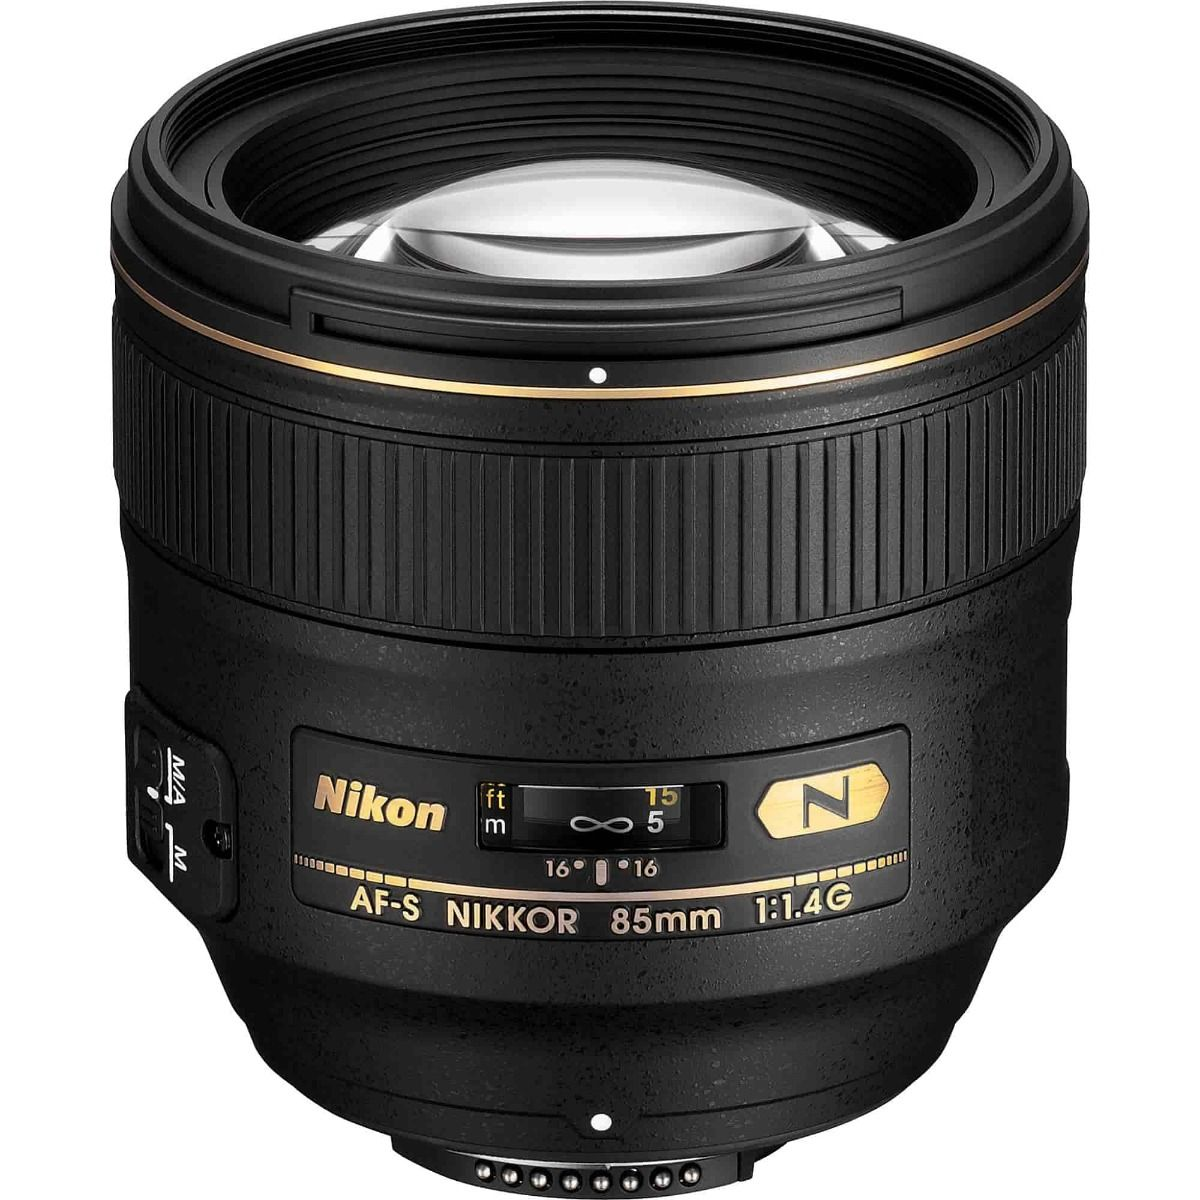 Nikon AF-S 85mm f/1.4G Lens,Nikon AF-S 85mm f/1.4G Lens,Nikon AF-S 85mm f/1.4G Lens